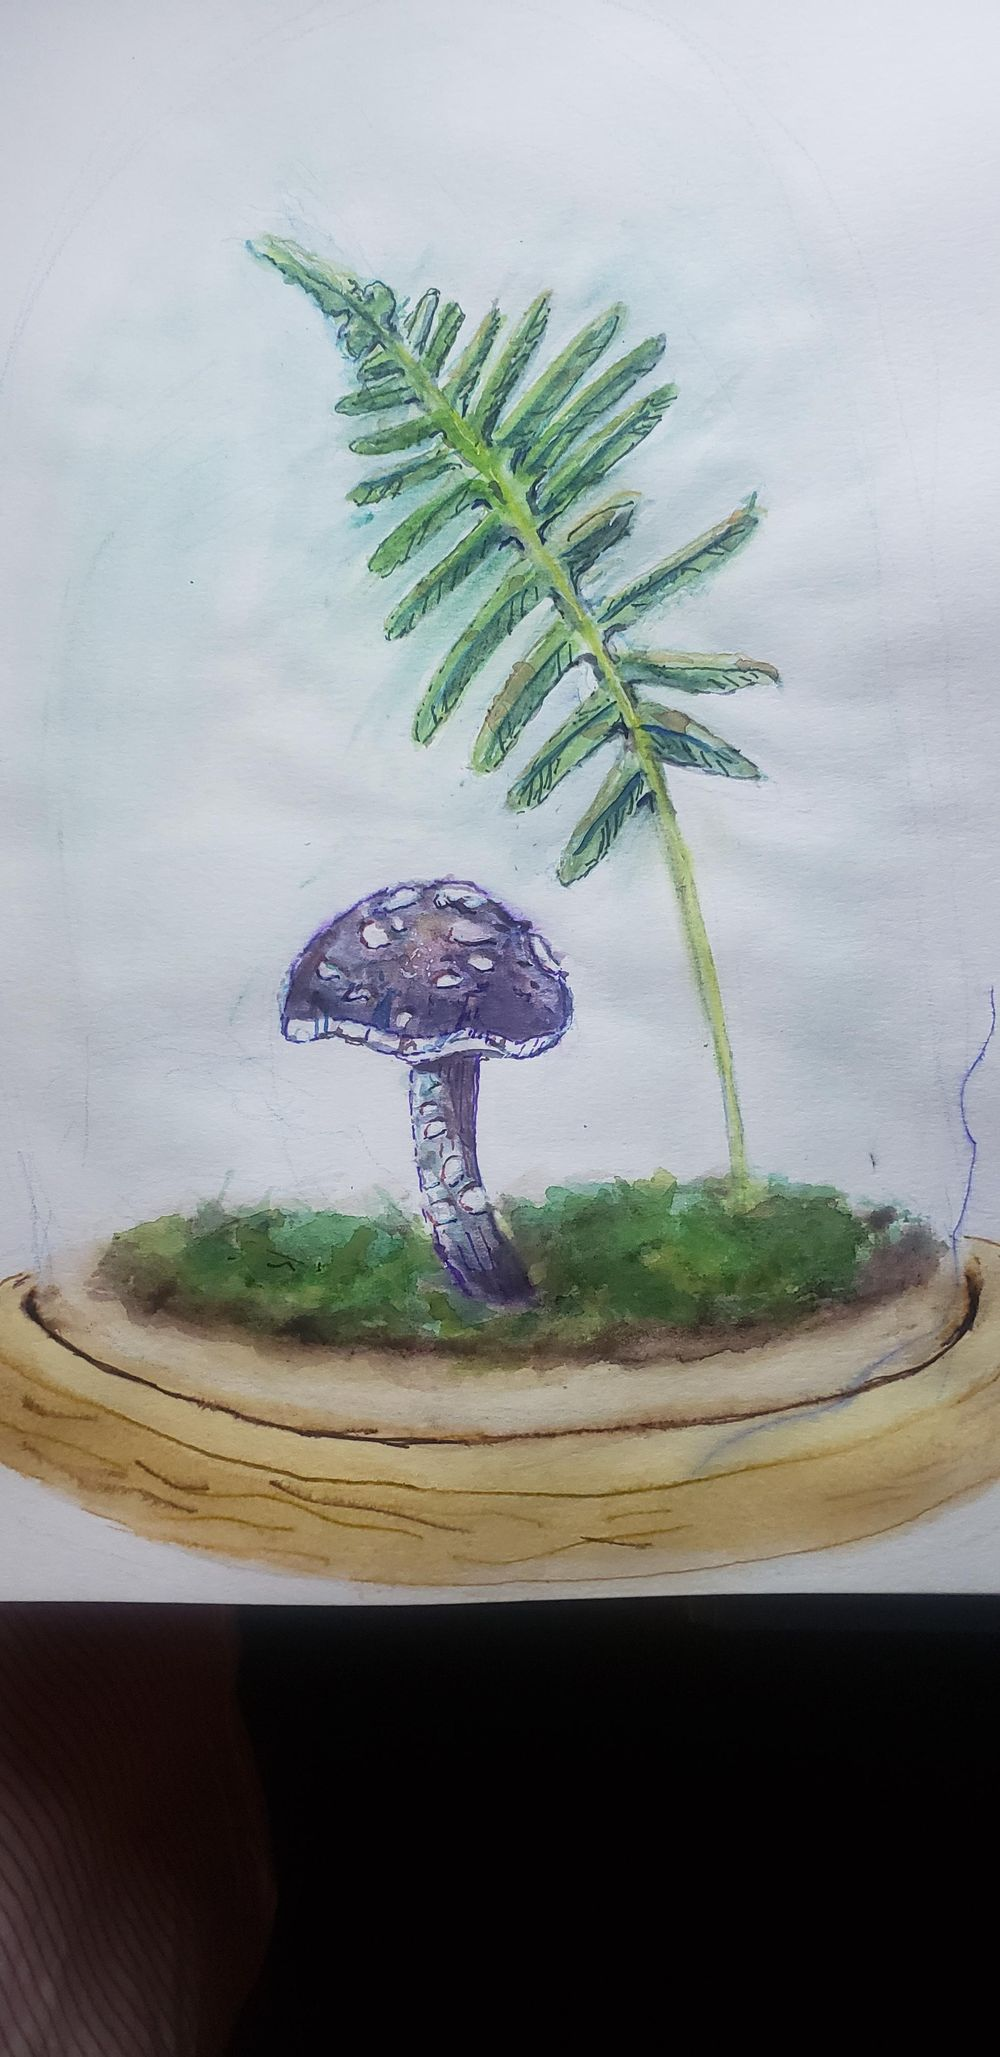 Mushroom & Fern - image 1 - student project